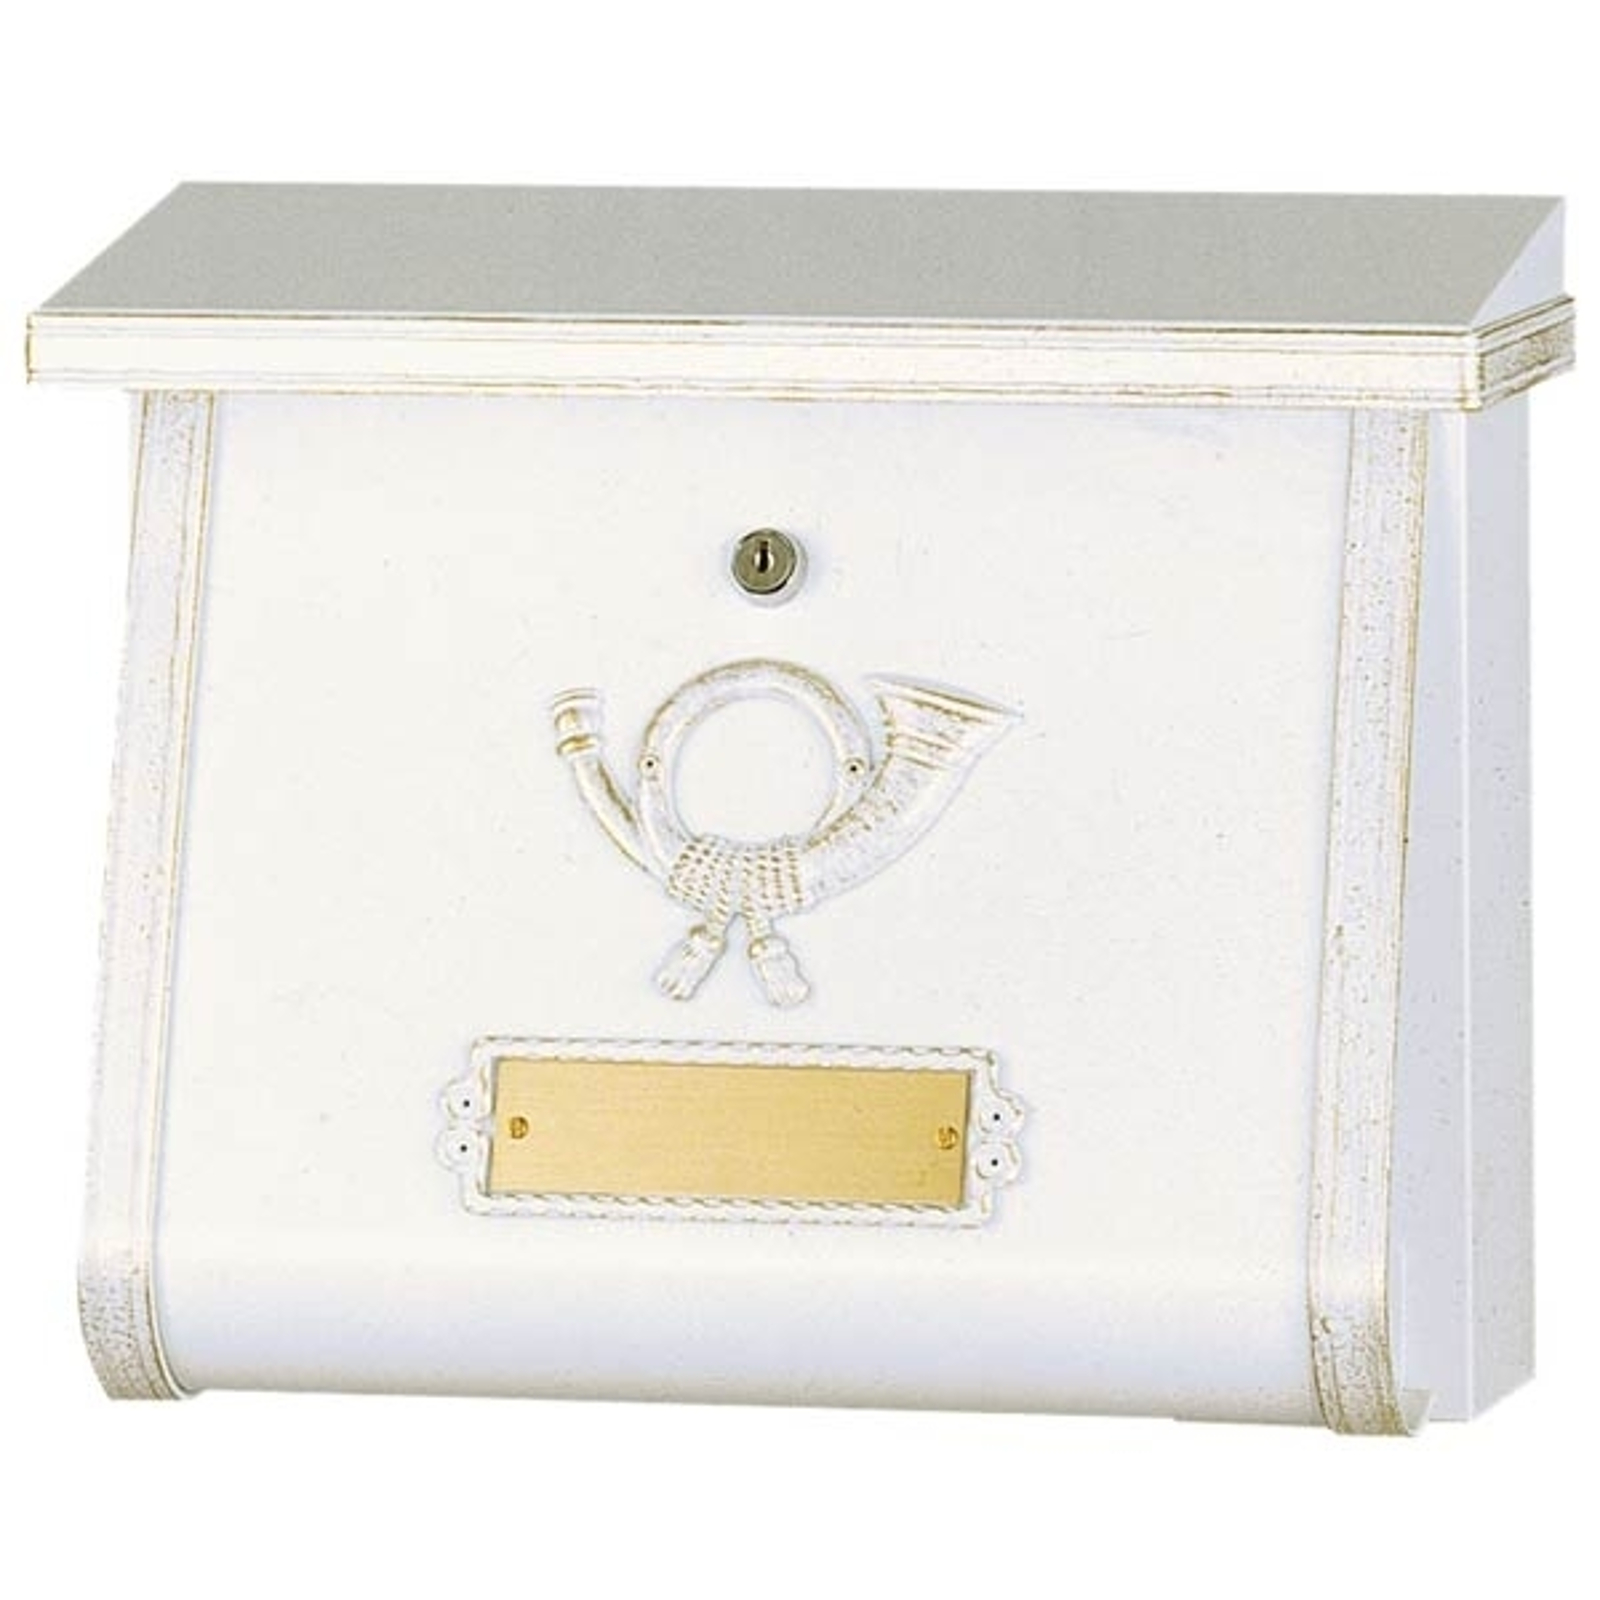 Konstfull postlåda MULPI vit/guldpatinerad